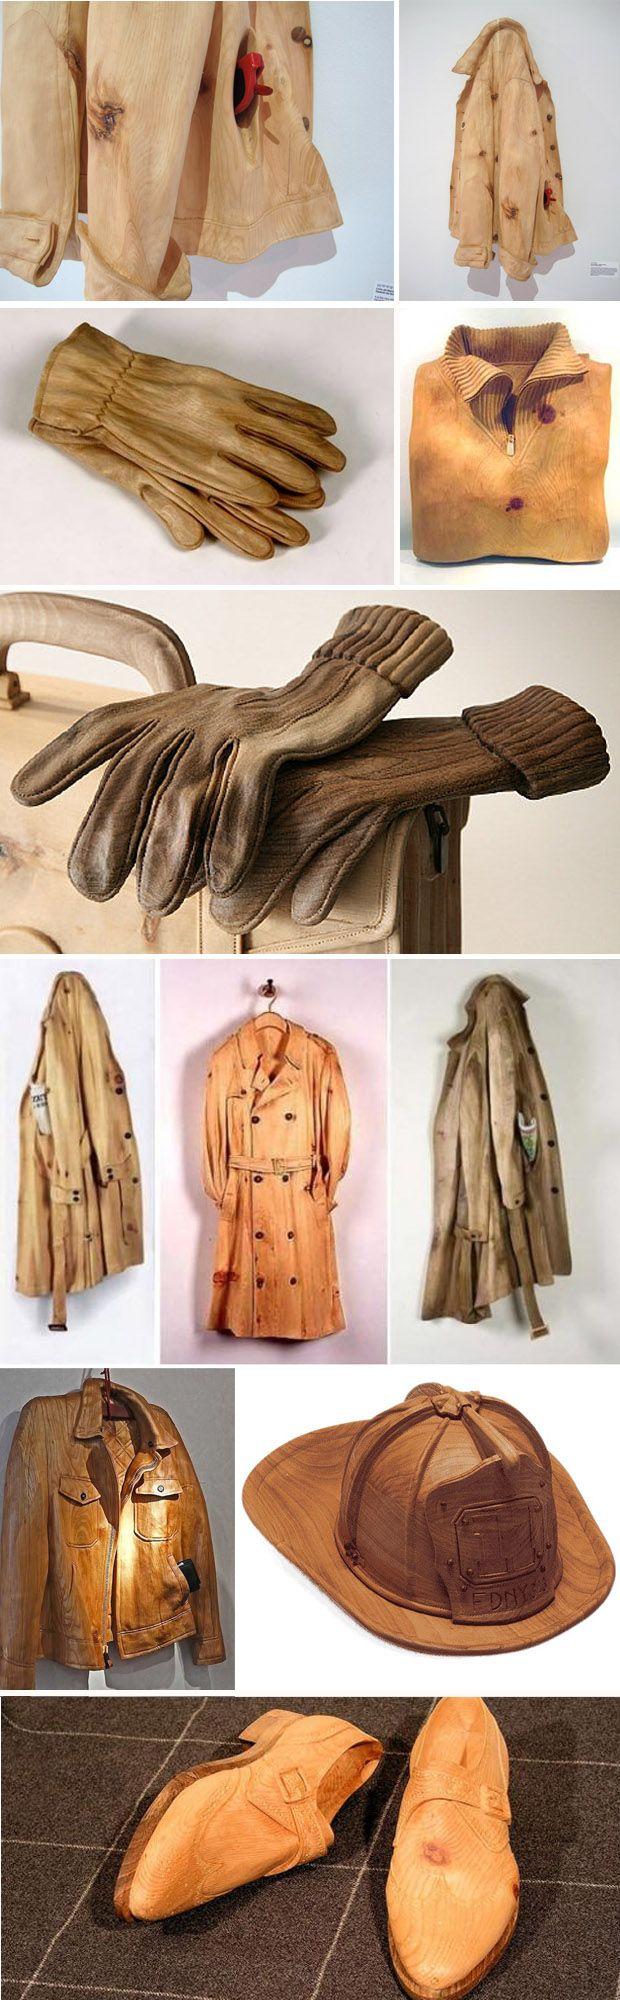 Livio De Marchi - Wood carvings